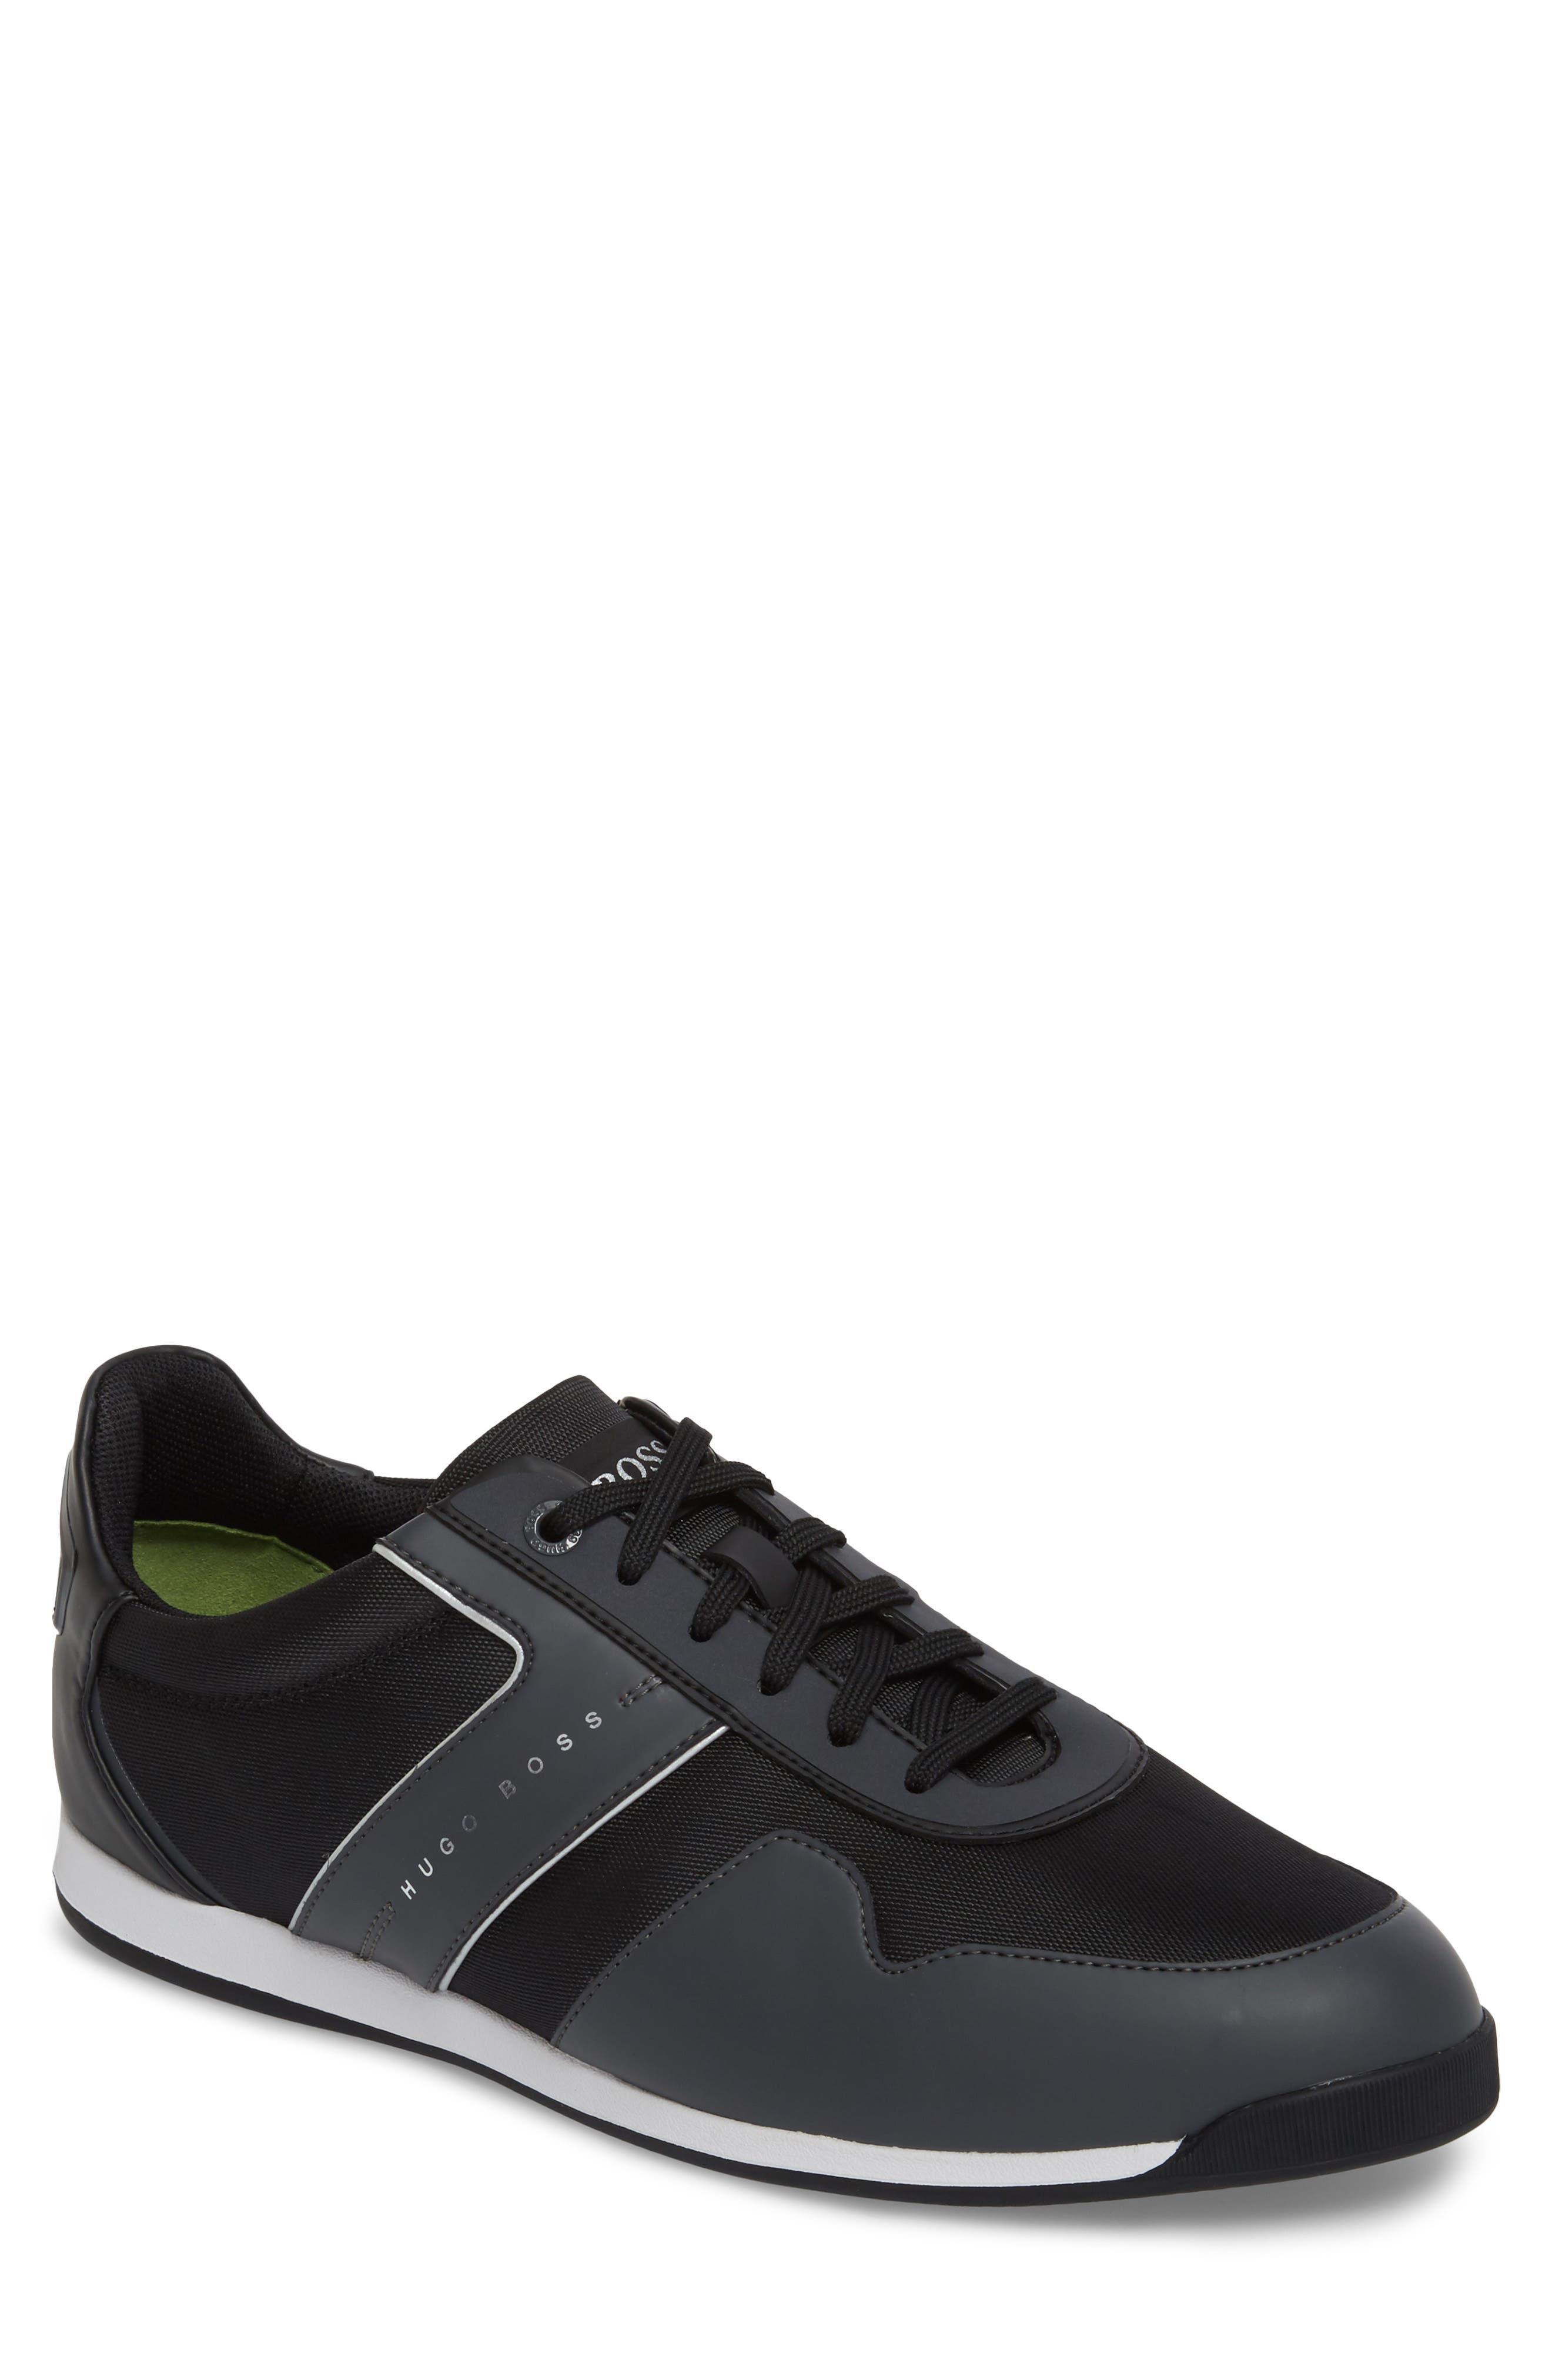 Maze Water Resistant Low Top Sneaker,                             Main thumbnail 1, color,                             020